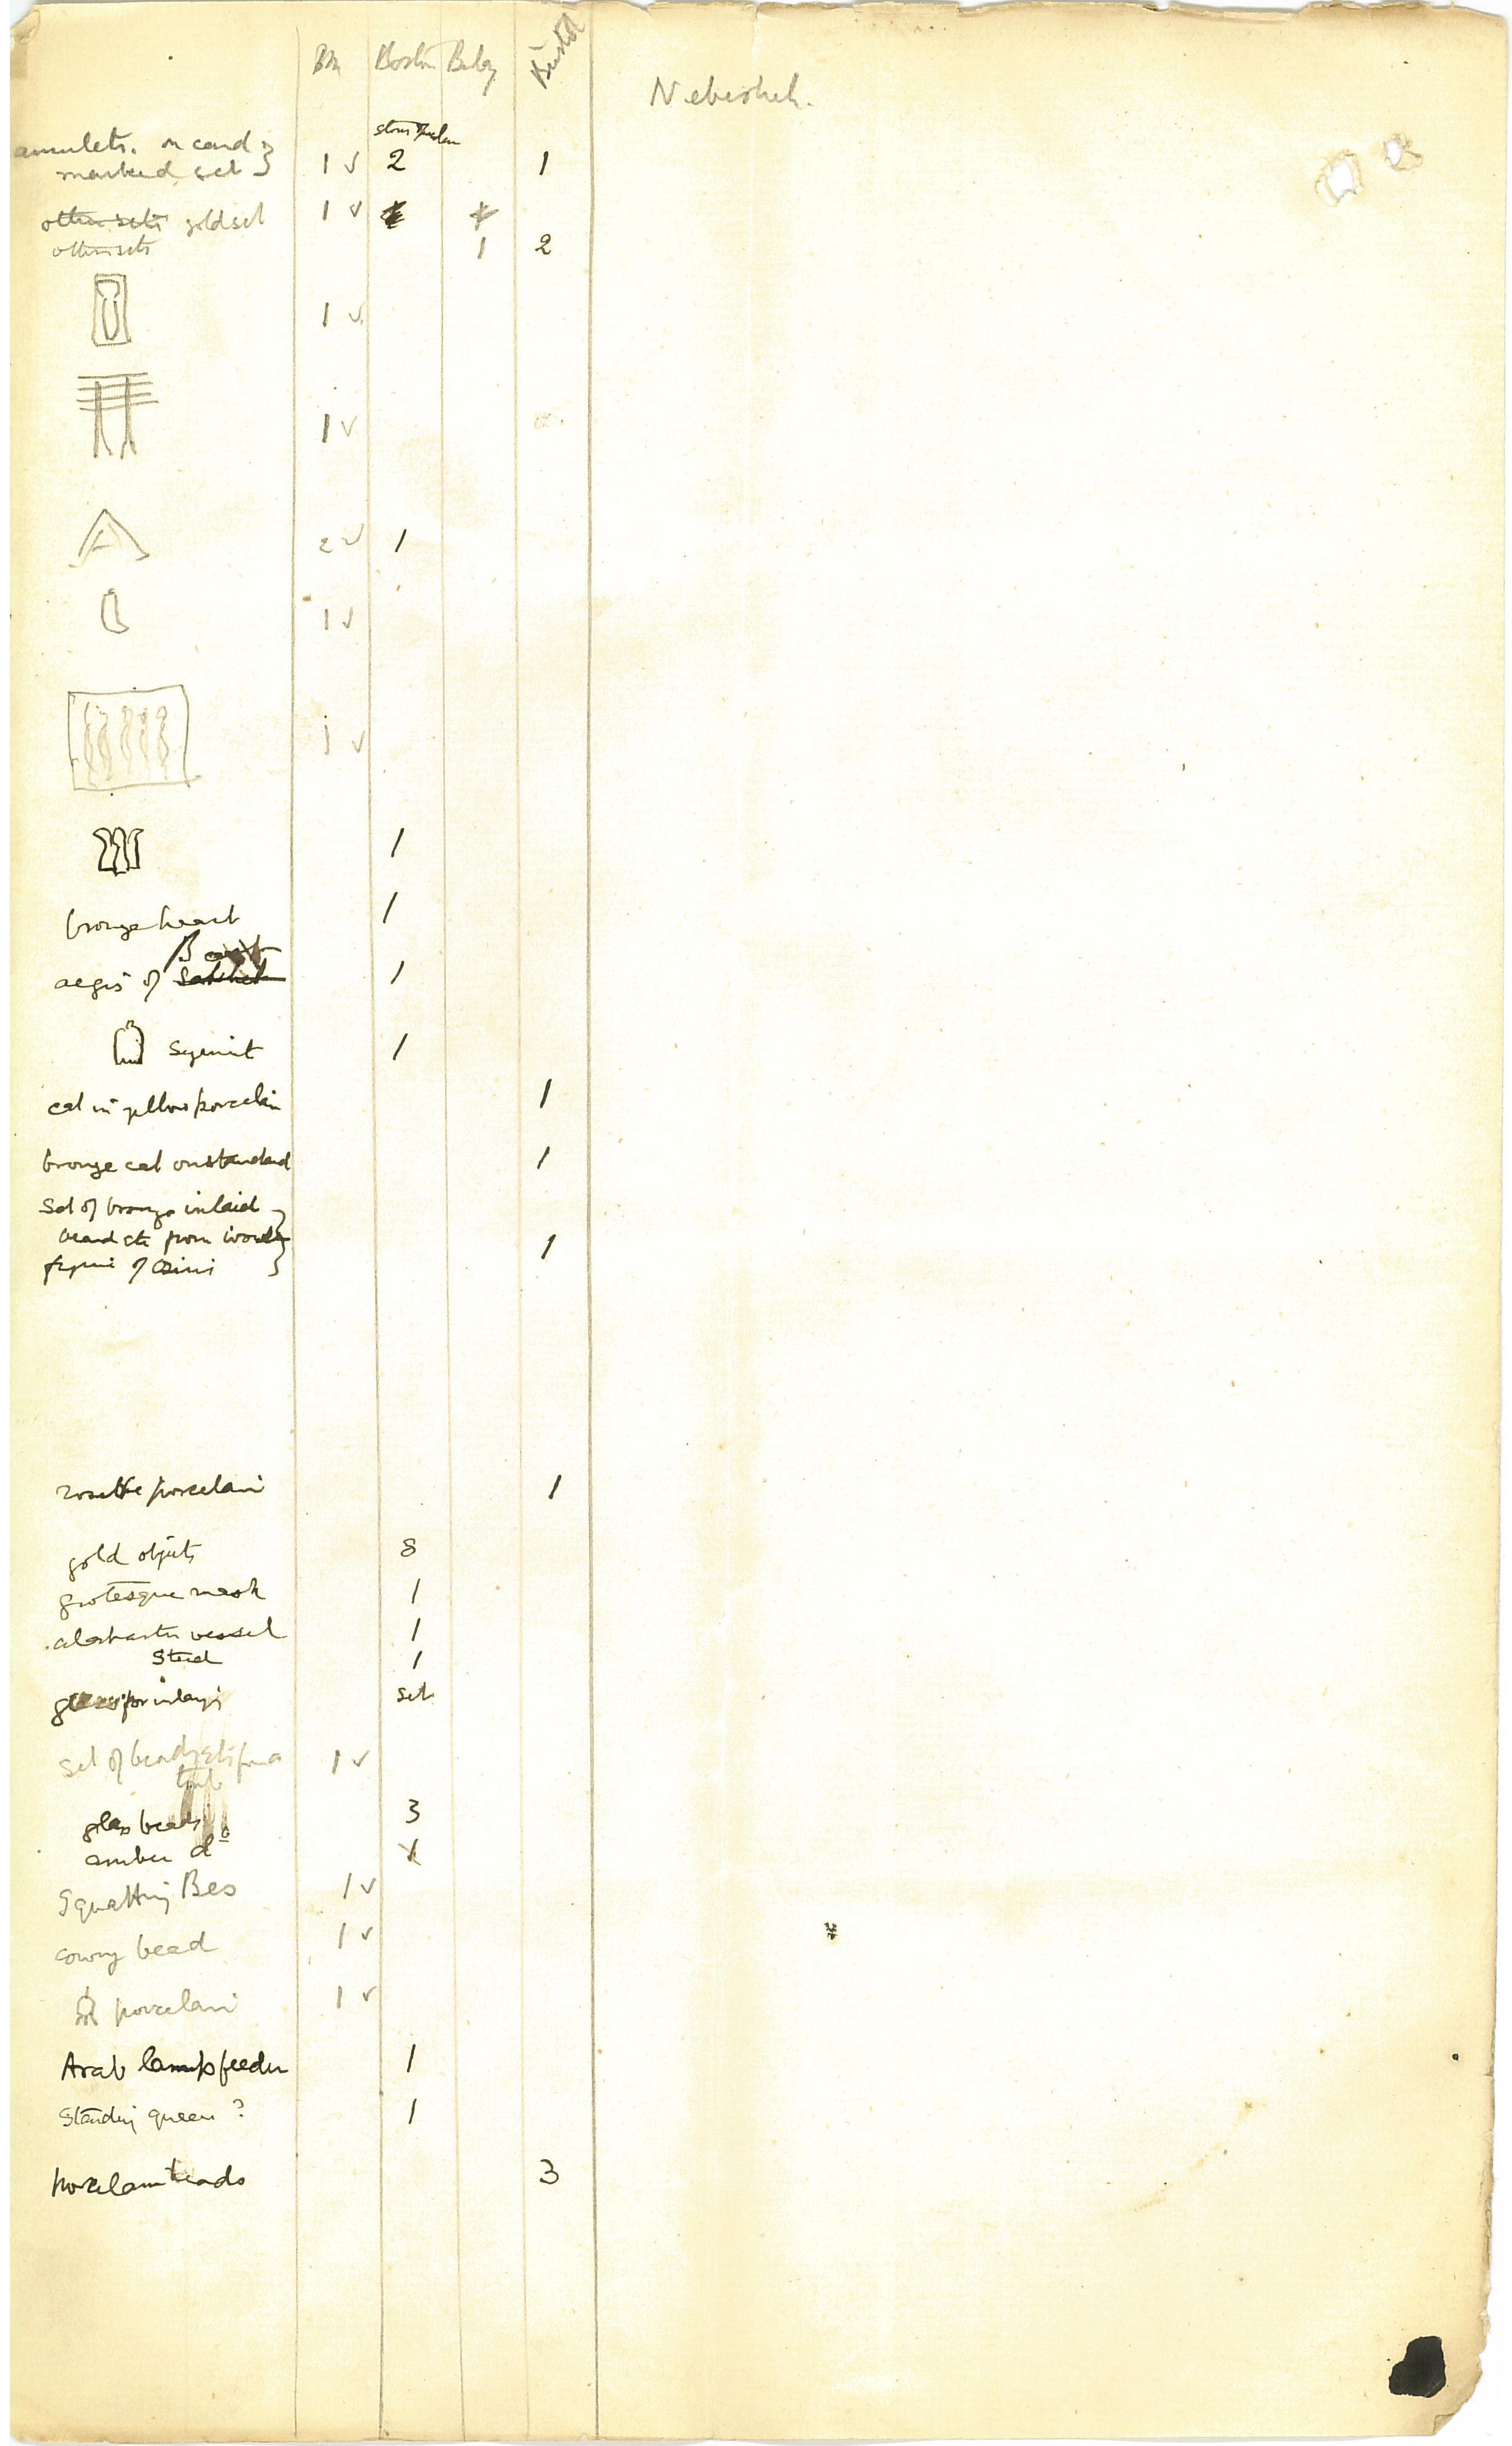 1886 Nebesheh Tell Dafana 1884 el-Qantara, Tell Gemayemi, Tell Sueilin DIST.09.01u